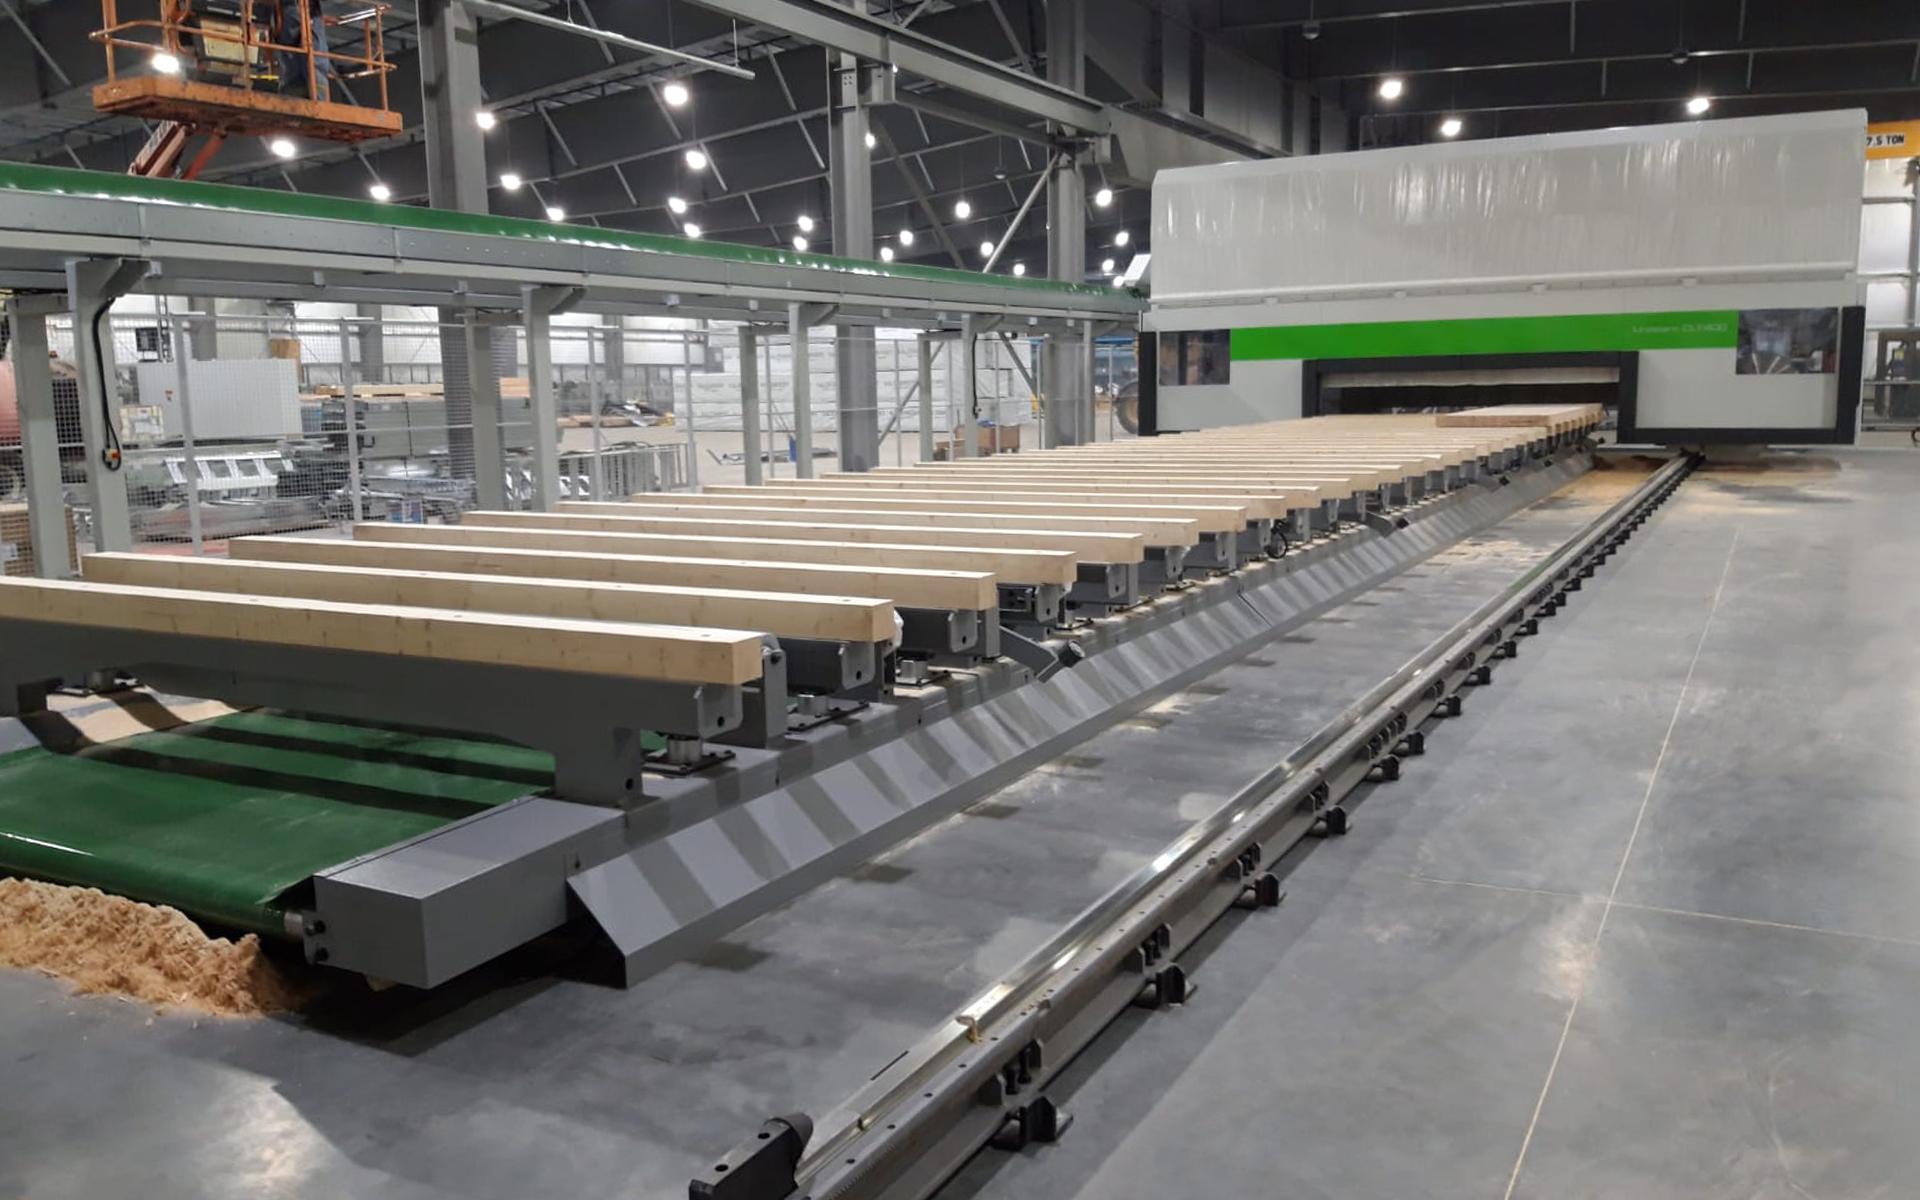 Kalesnikoff Mass Timber Begins New Era: Photo 1